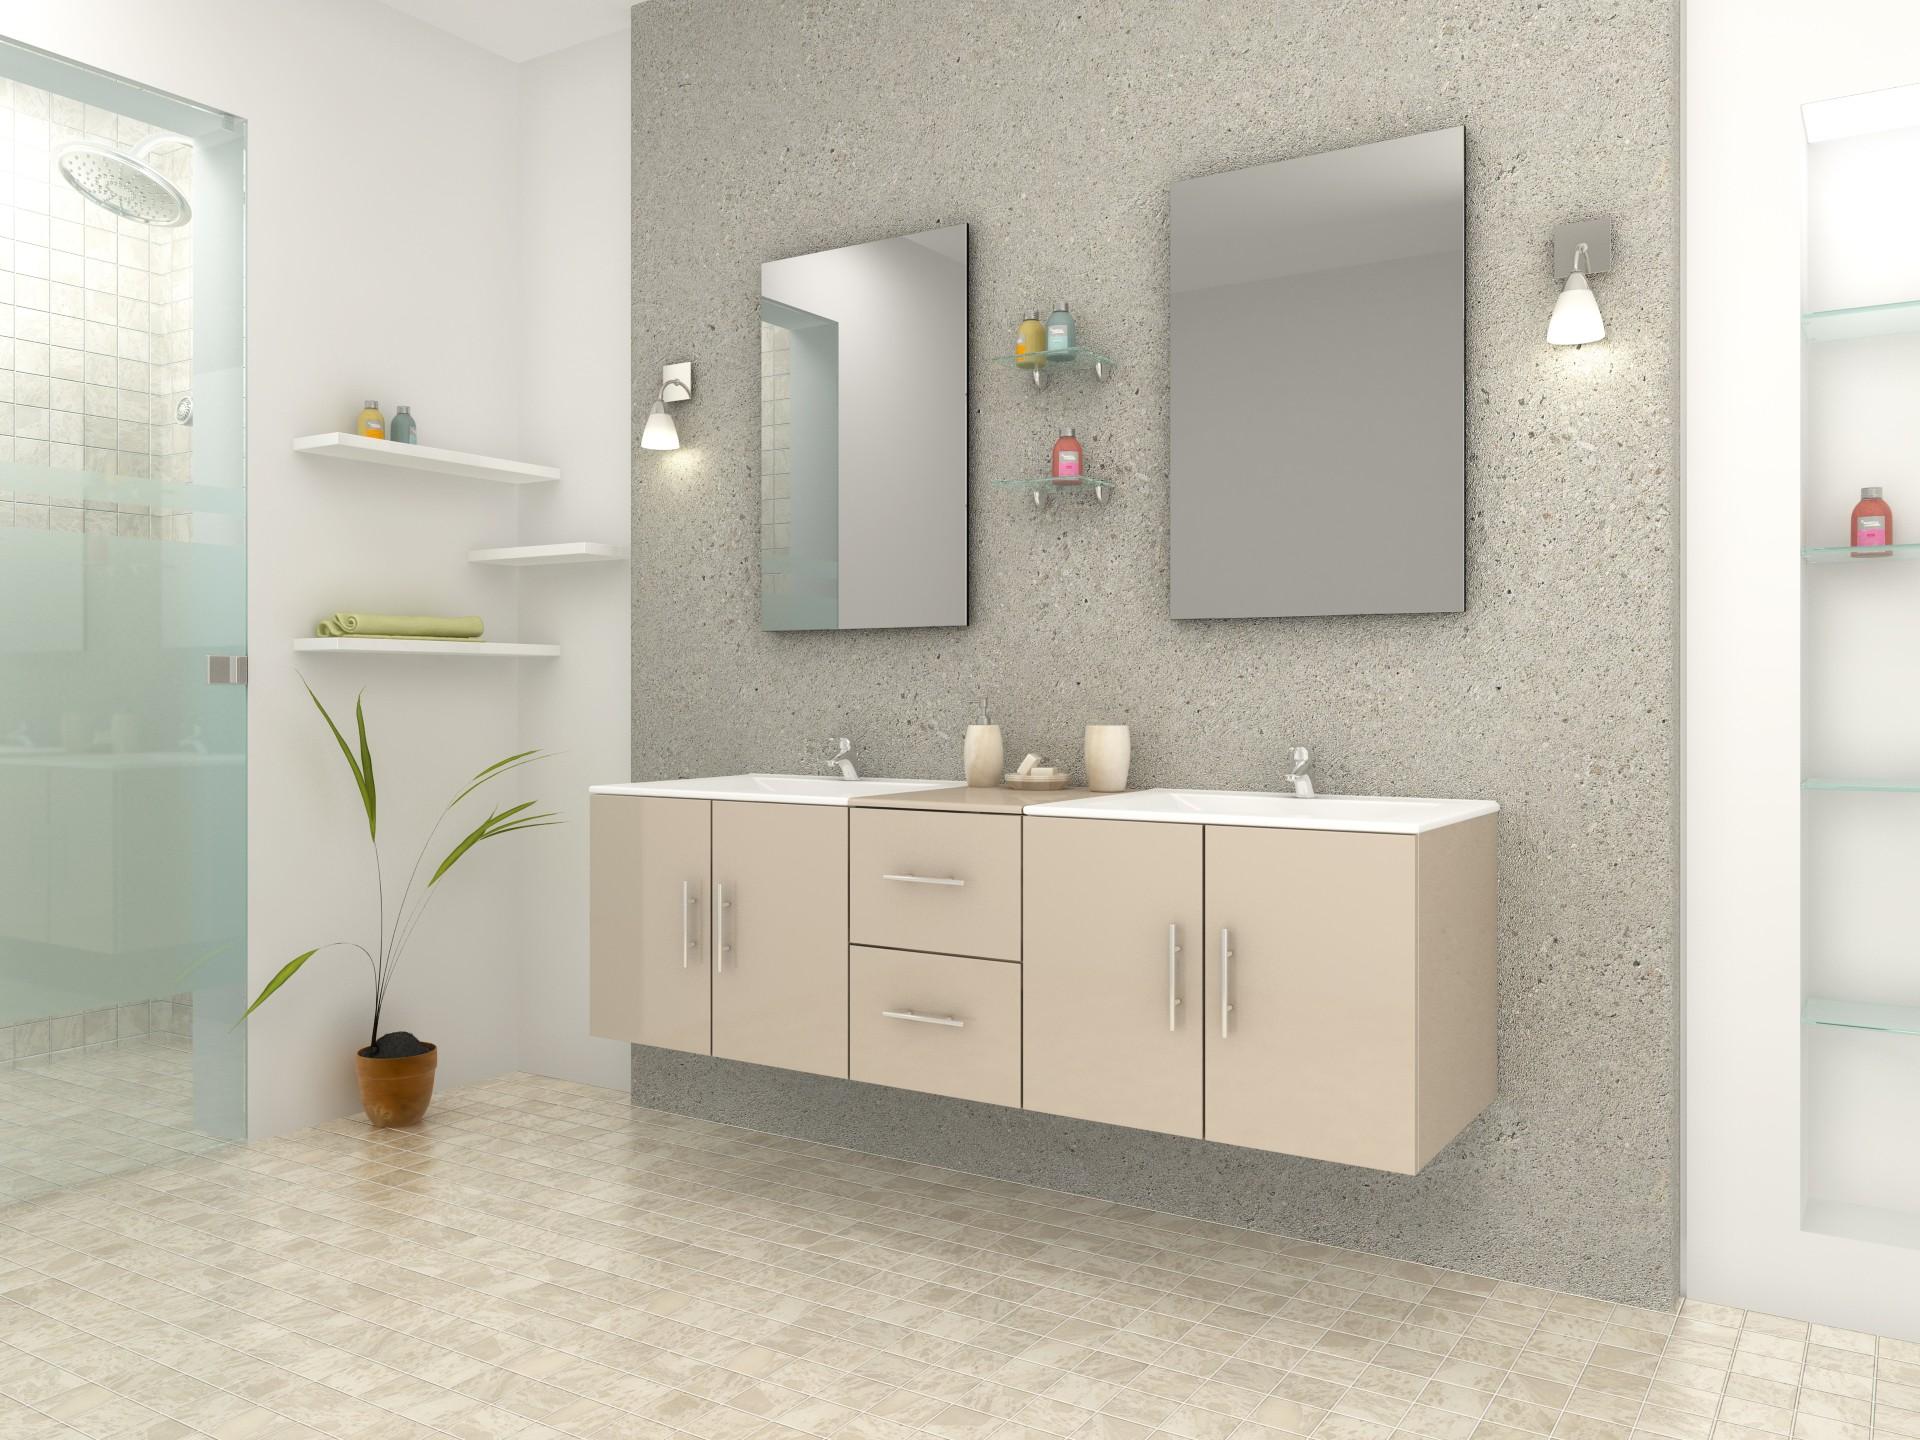 meuble de salle de bain design double vasque complet cappuccino. Black Bedroom Furniture Sets. Home Design Ideas